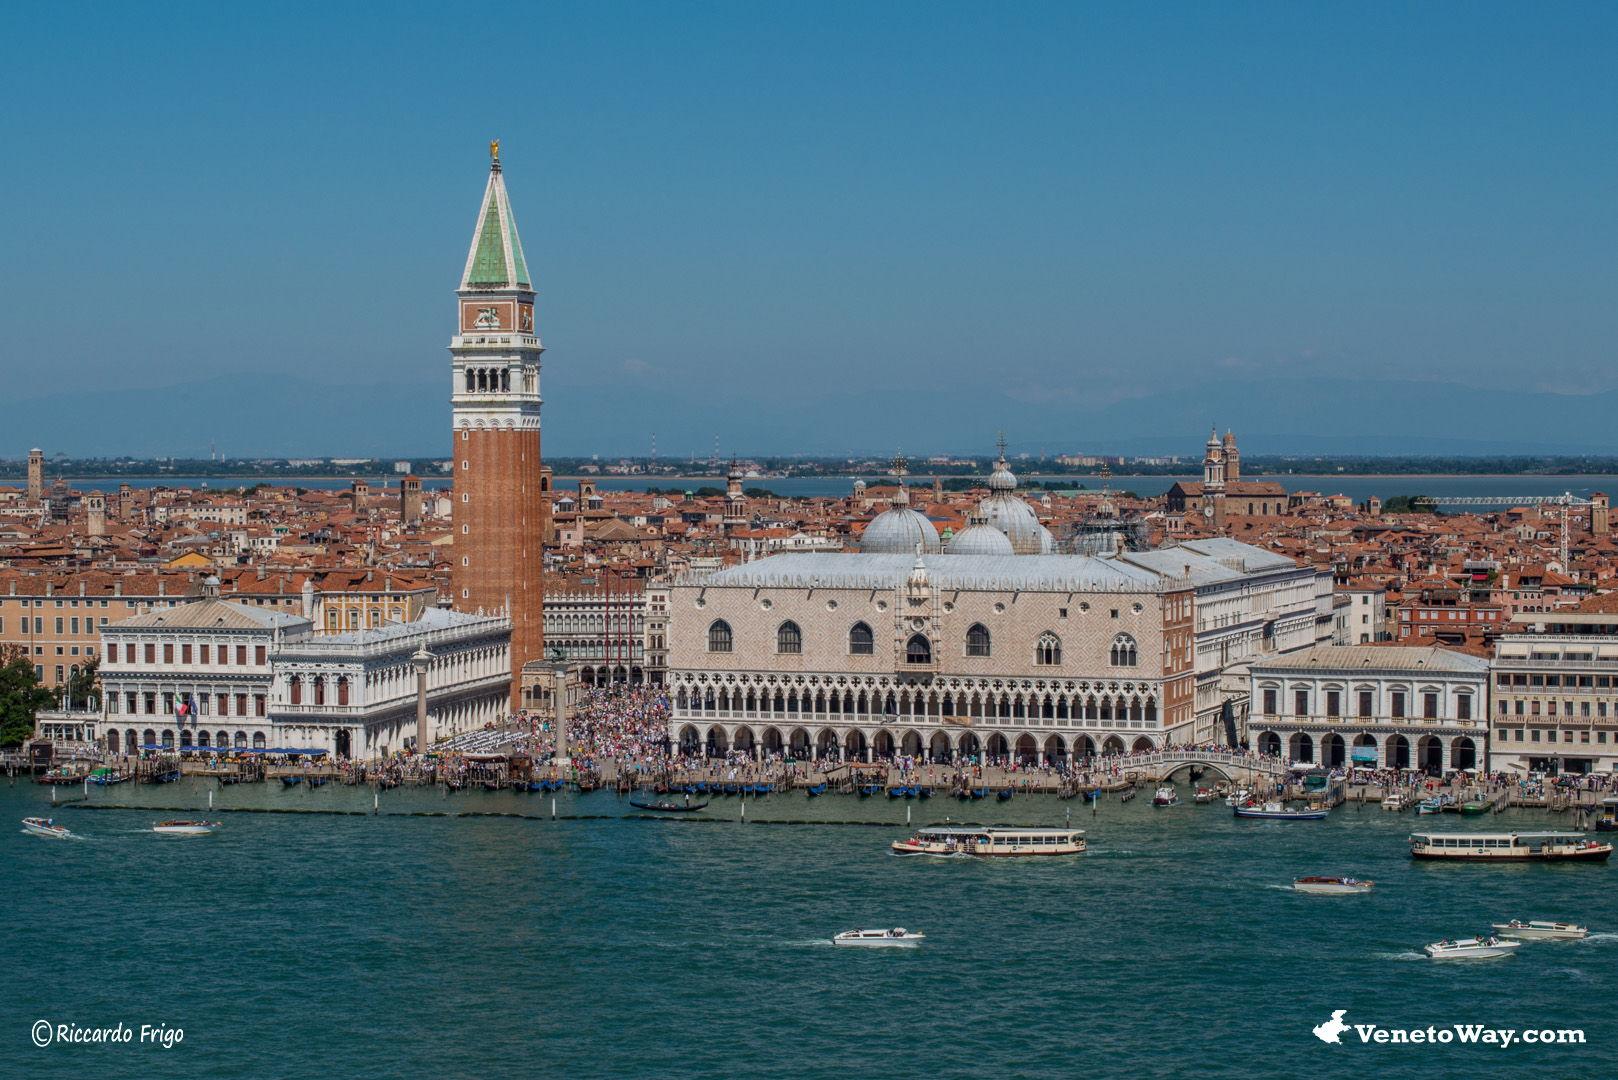 Palazzo Ducale - Sestiere San Marco